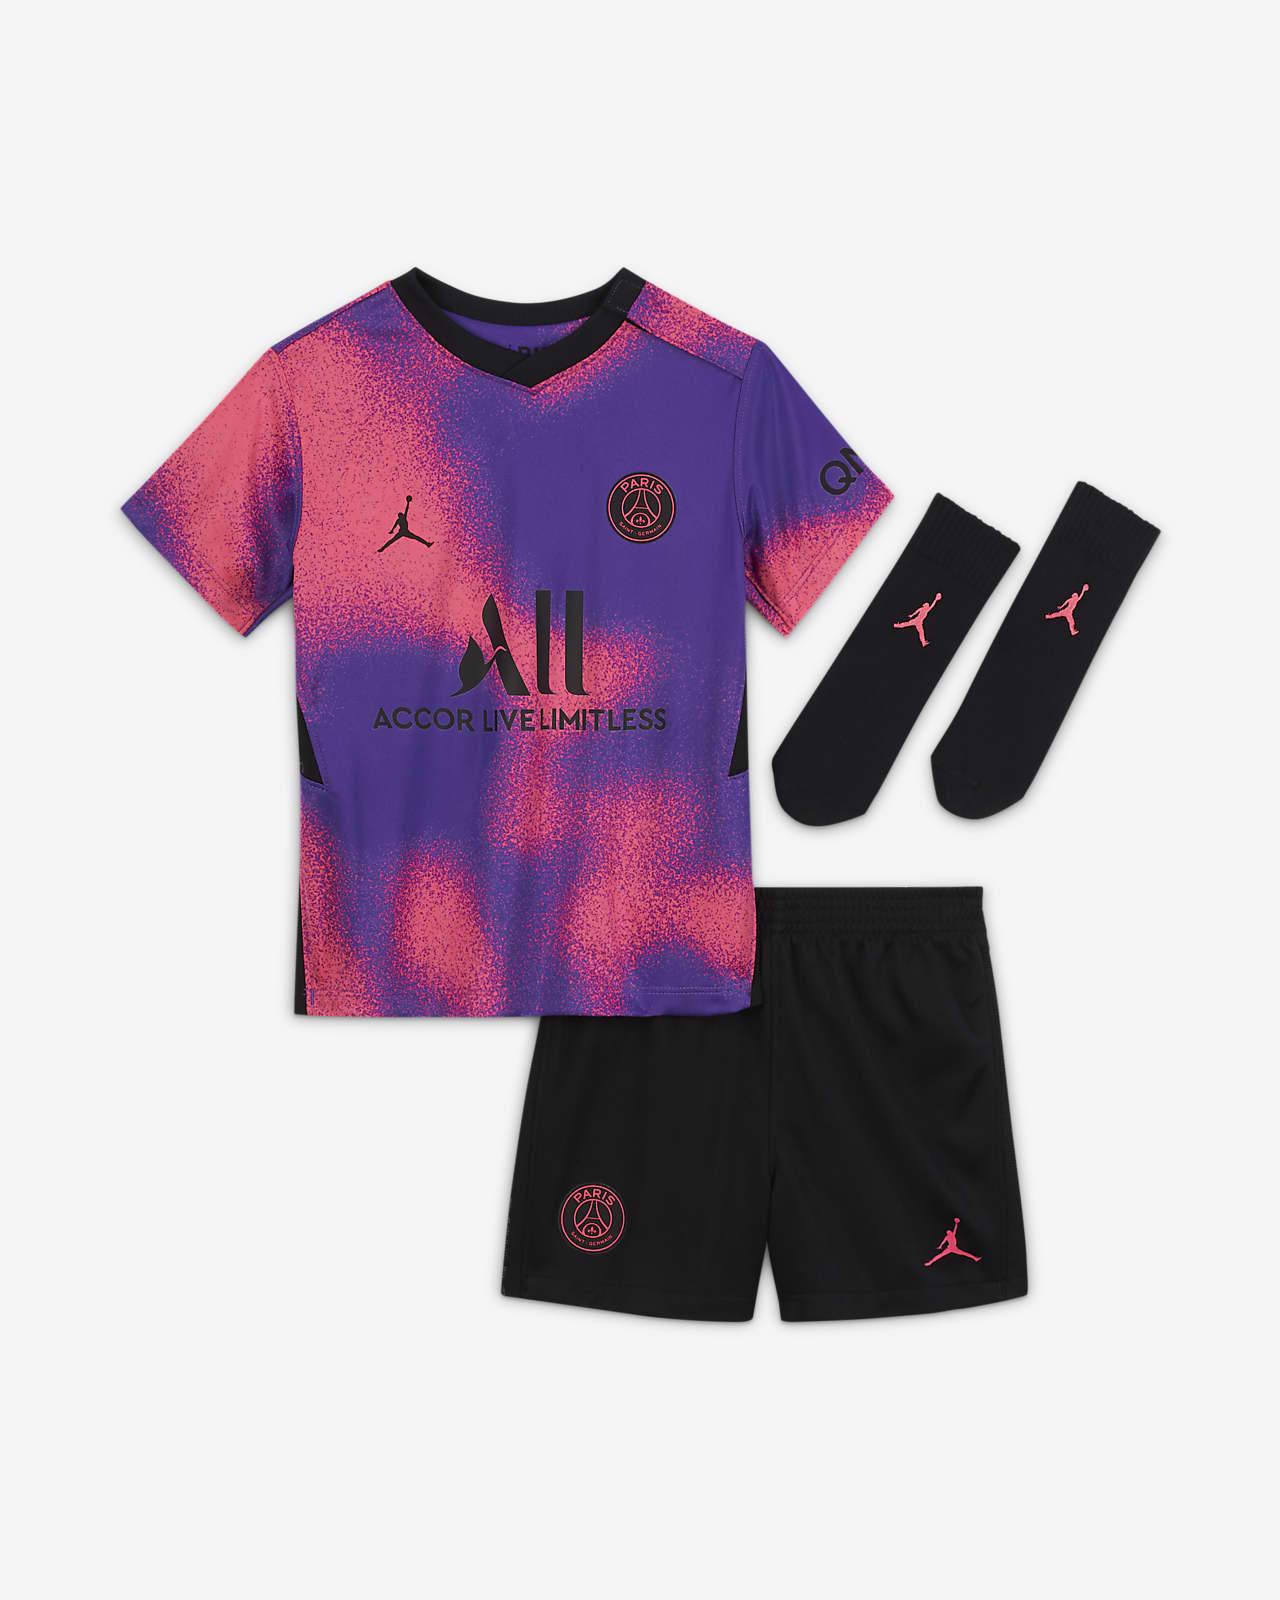 Paris Saint-Germain 2021/22 Fourth Baby & Toddler Football Kit